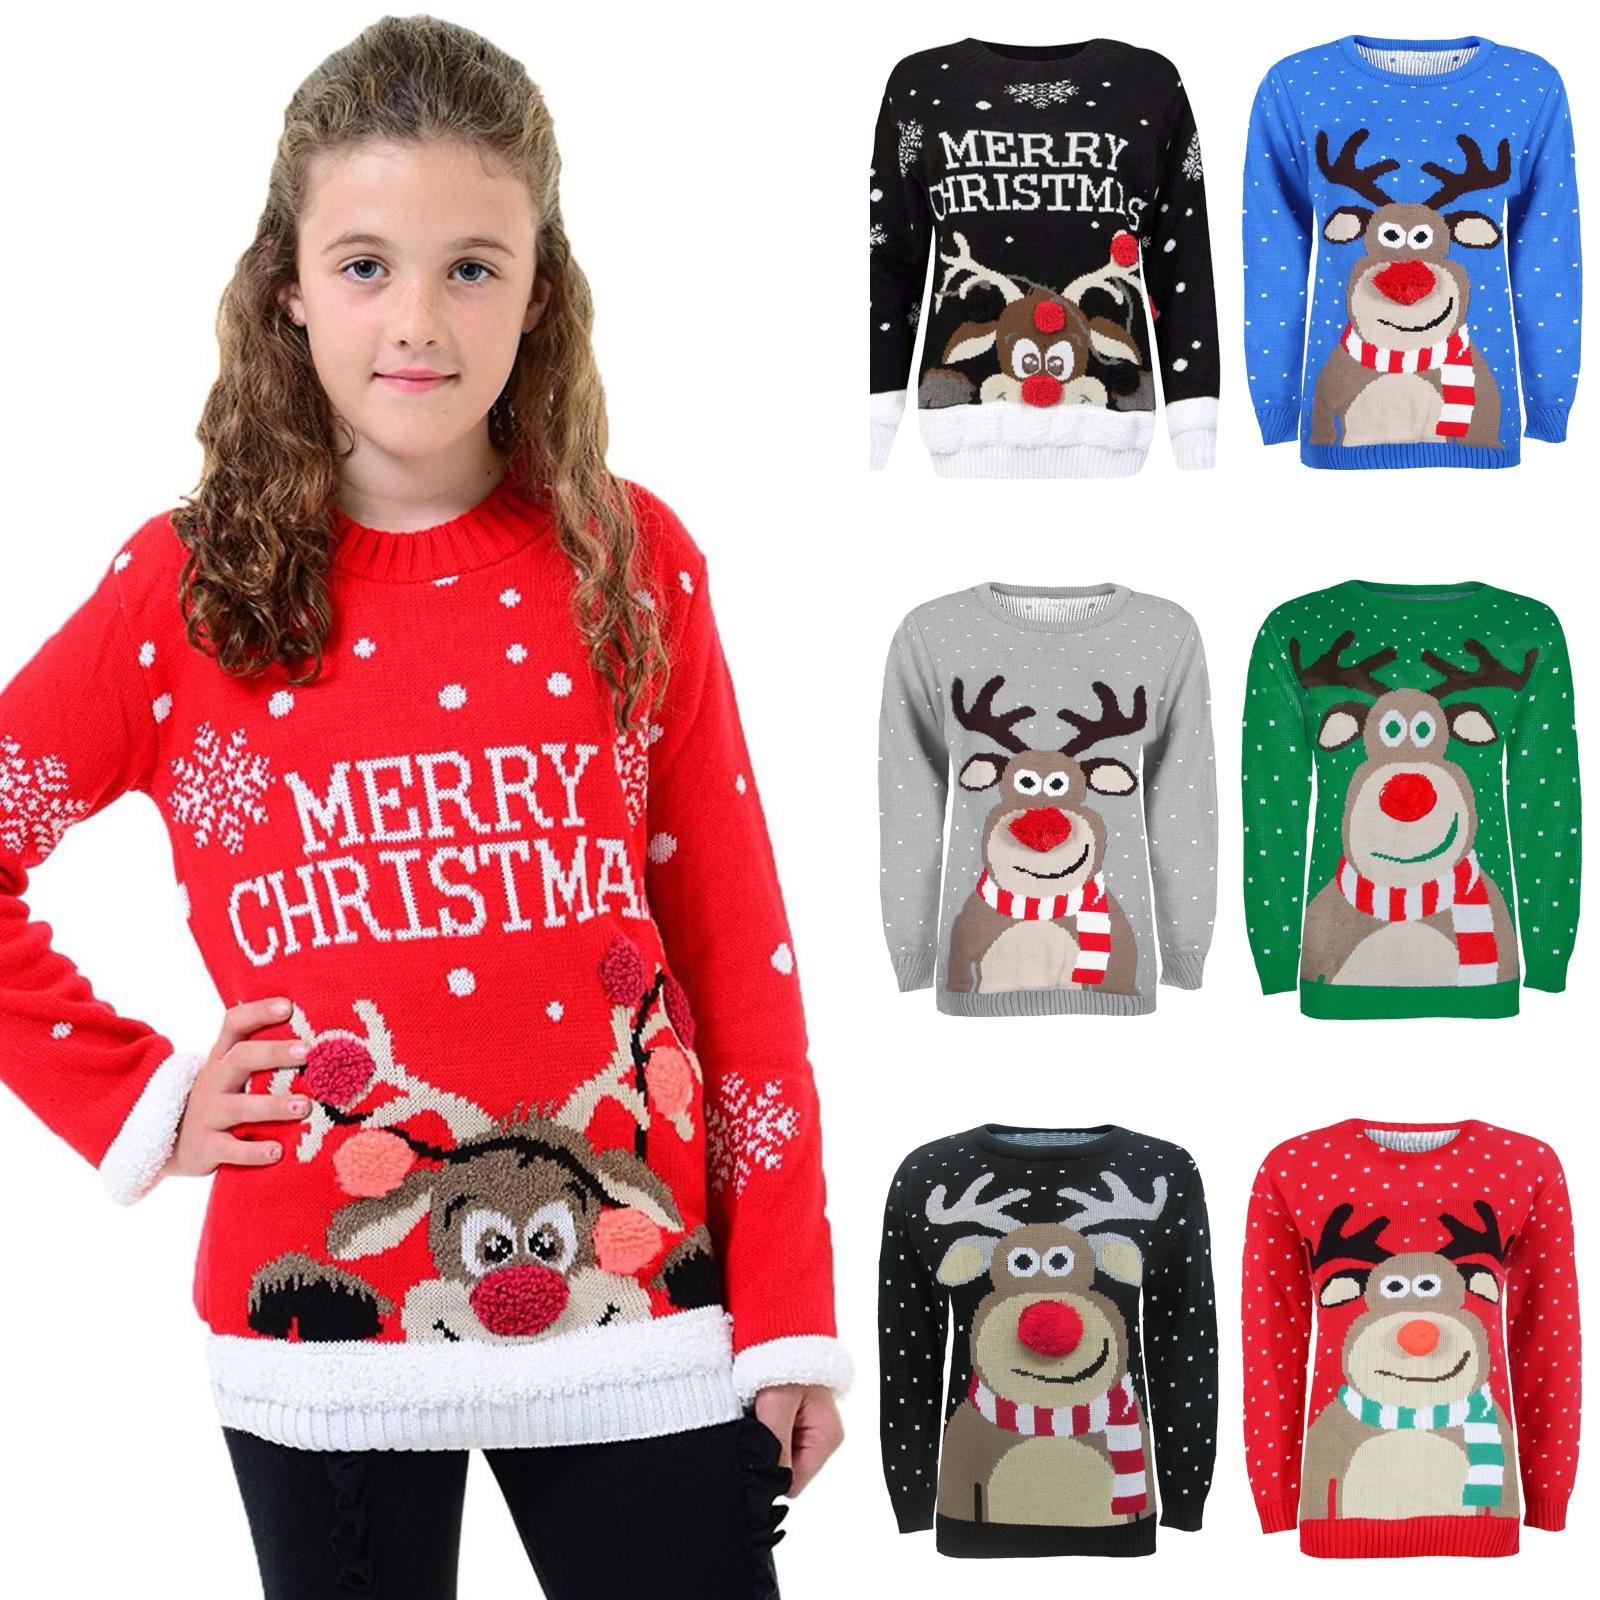 janisramone Girls Boys New Kids 3D Pom Pom Rudolph Reindeer Merry Christmas Knitted Xmas Jumper Sweater Top